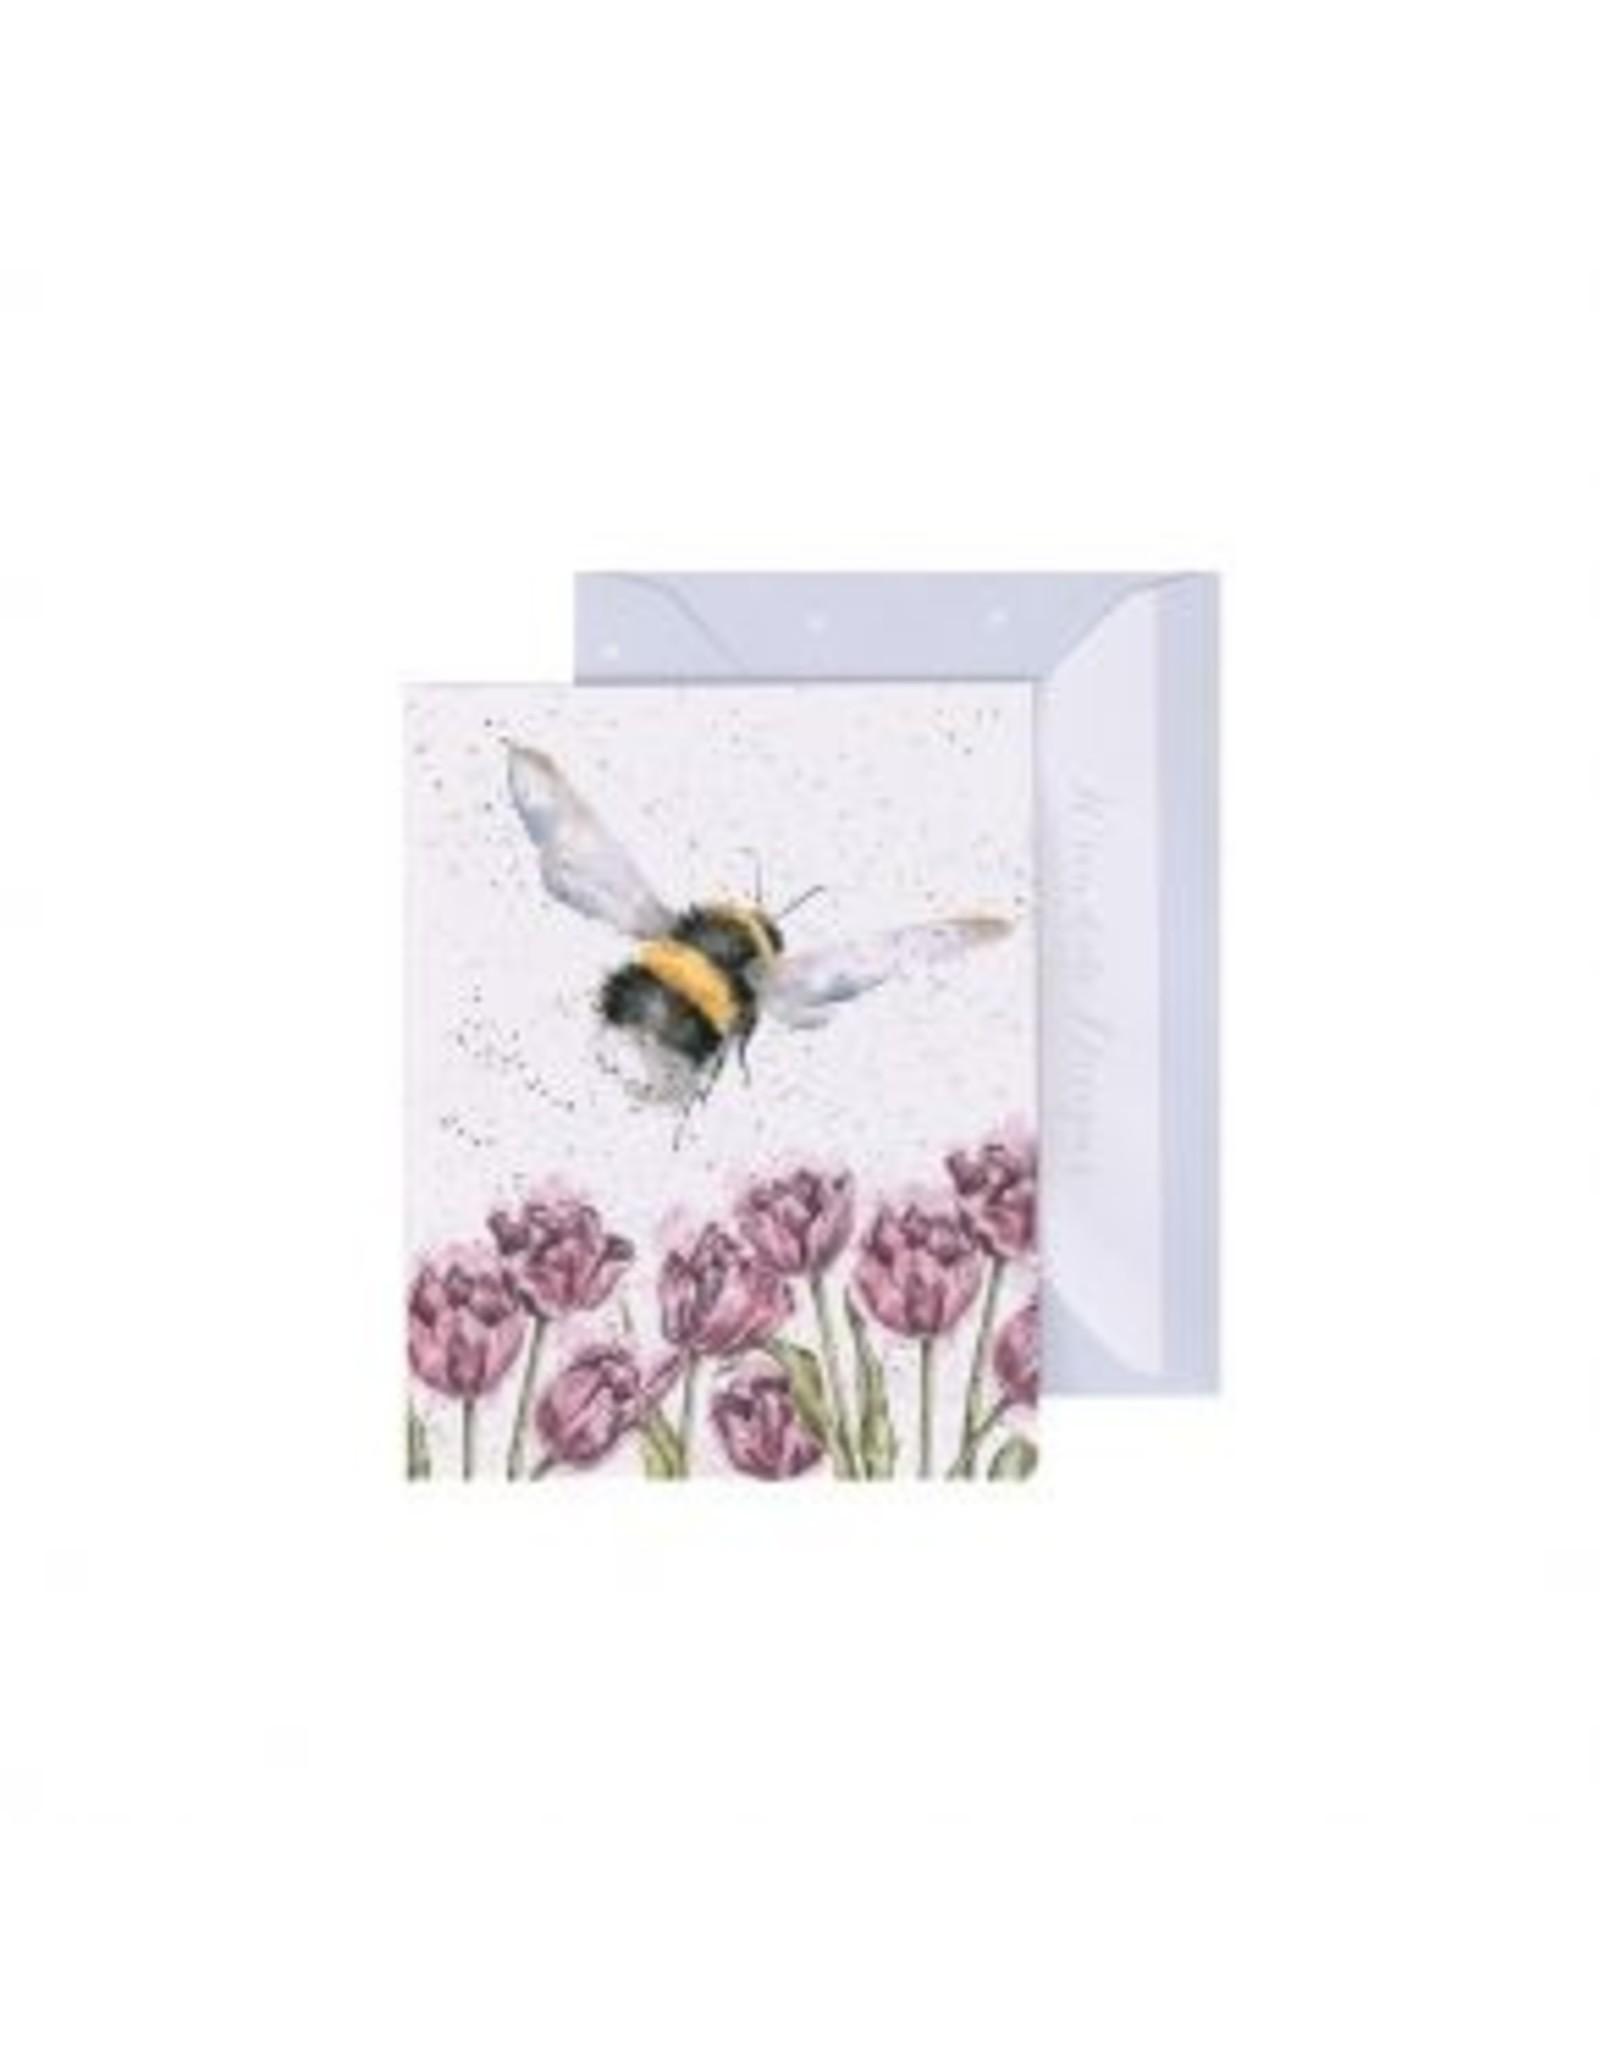 Wrendale Designs Miniature Card -  Flight of the Bumblebee